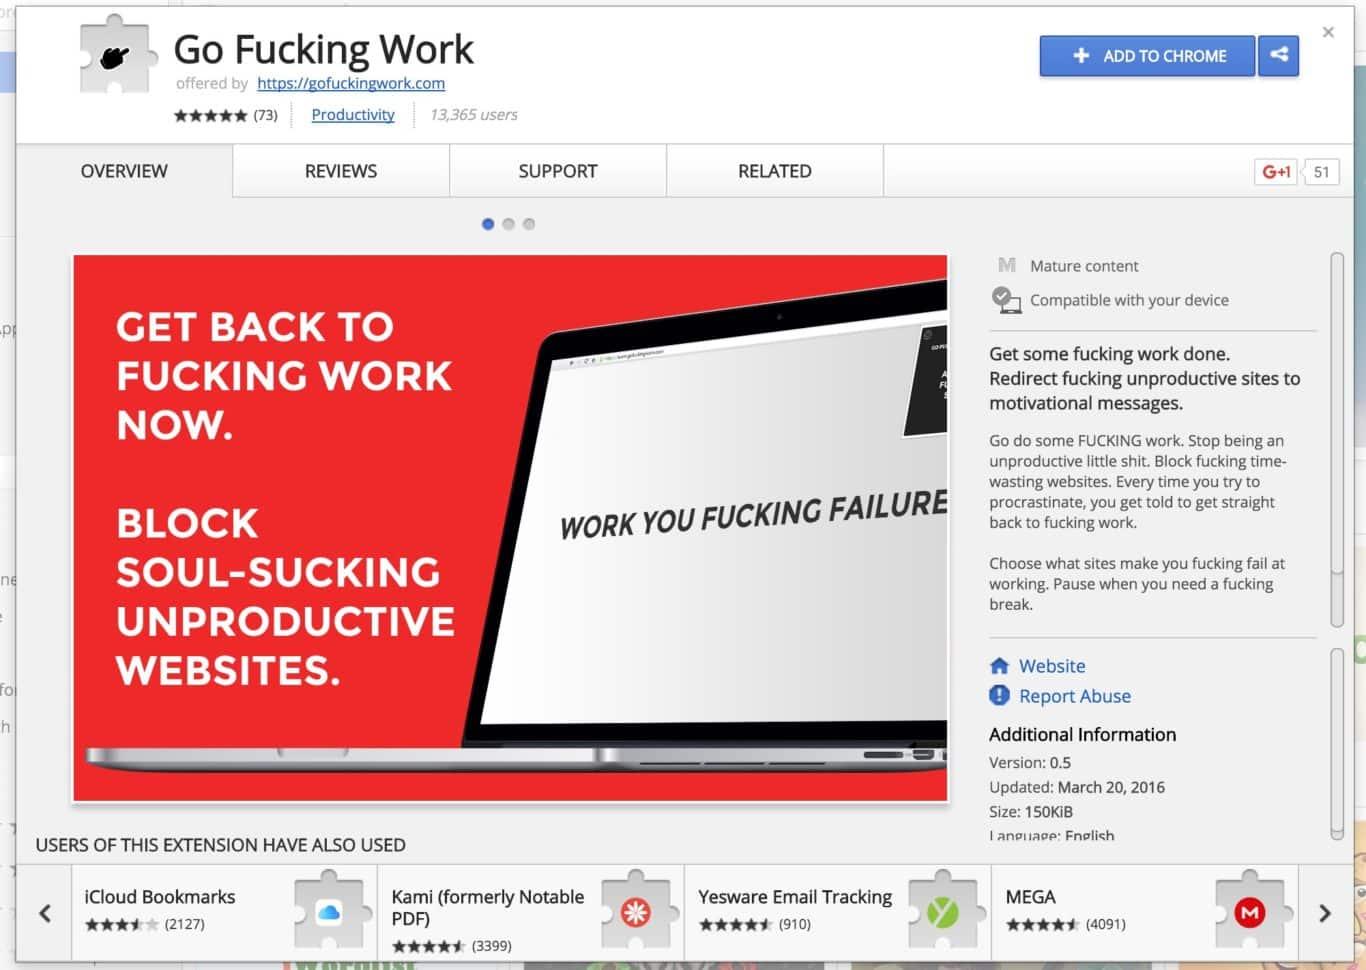 go fucking work!